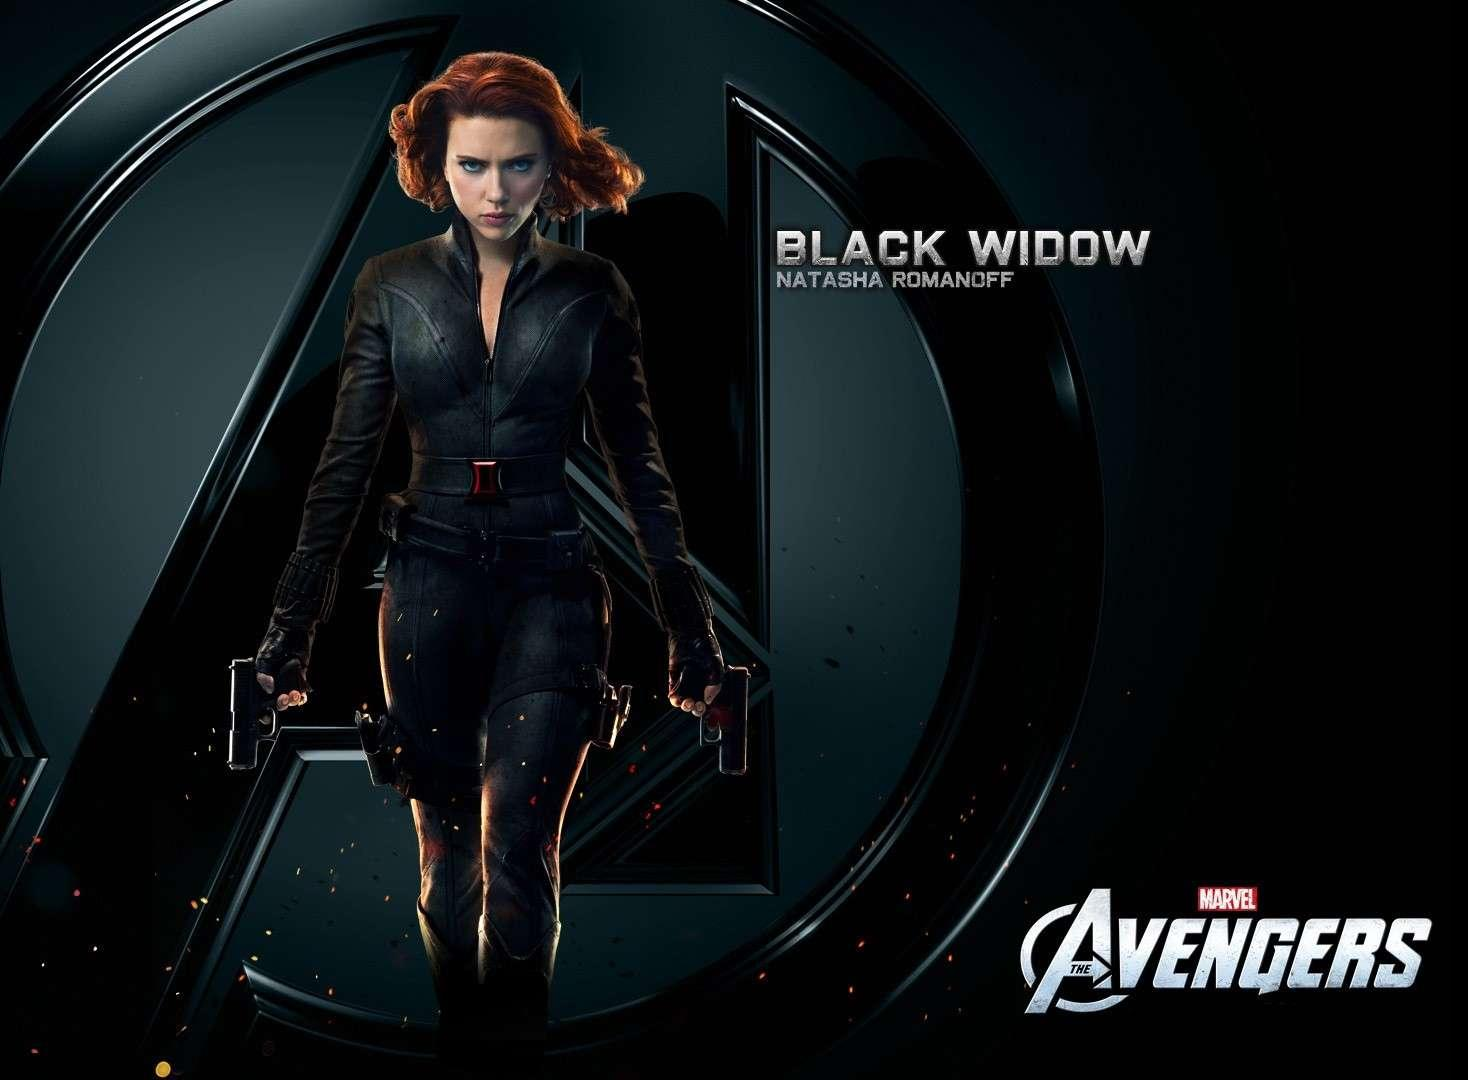 Black Widow The Avengers Wallpaper